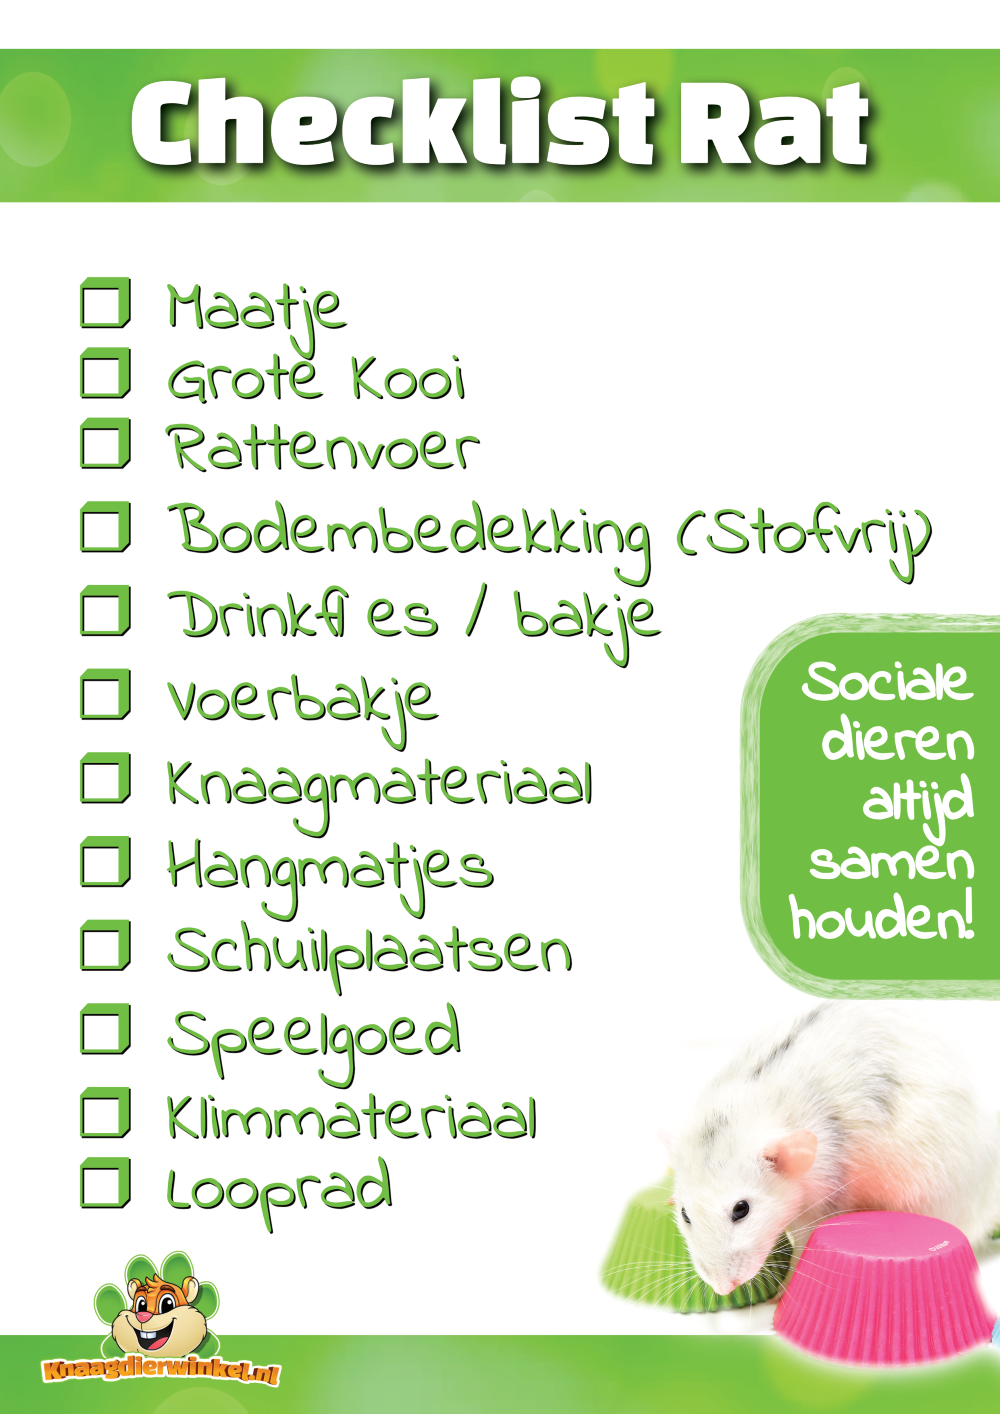 checklist rat